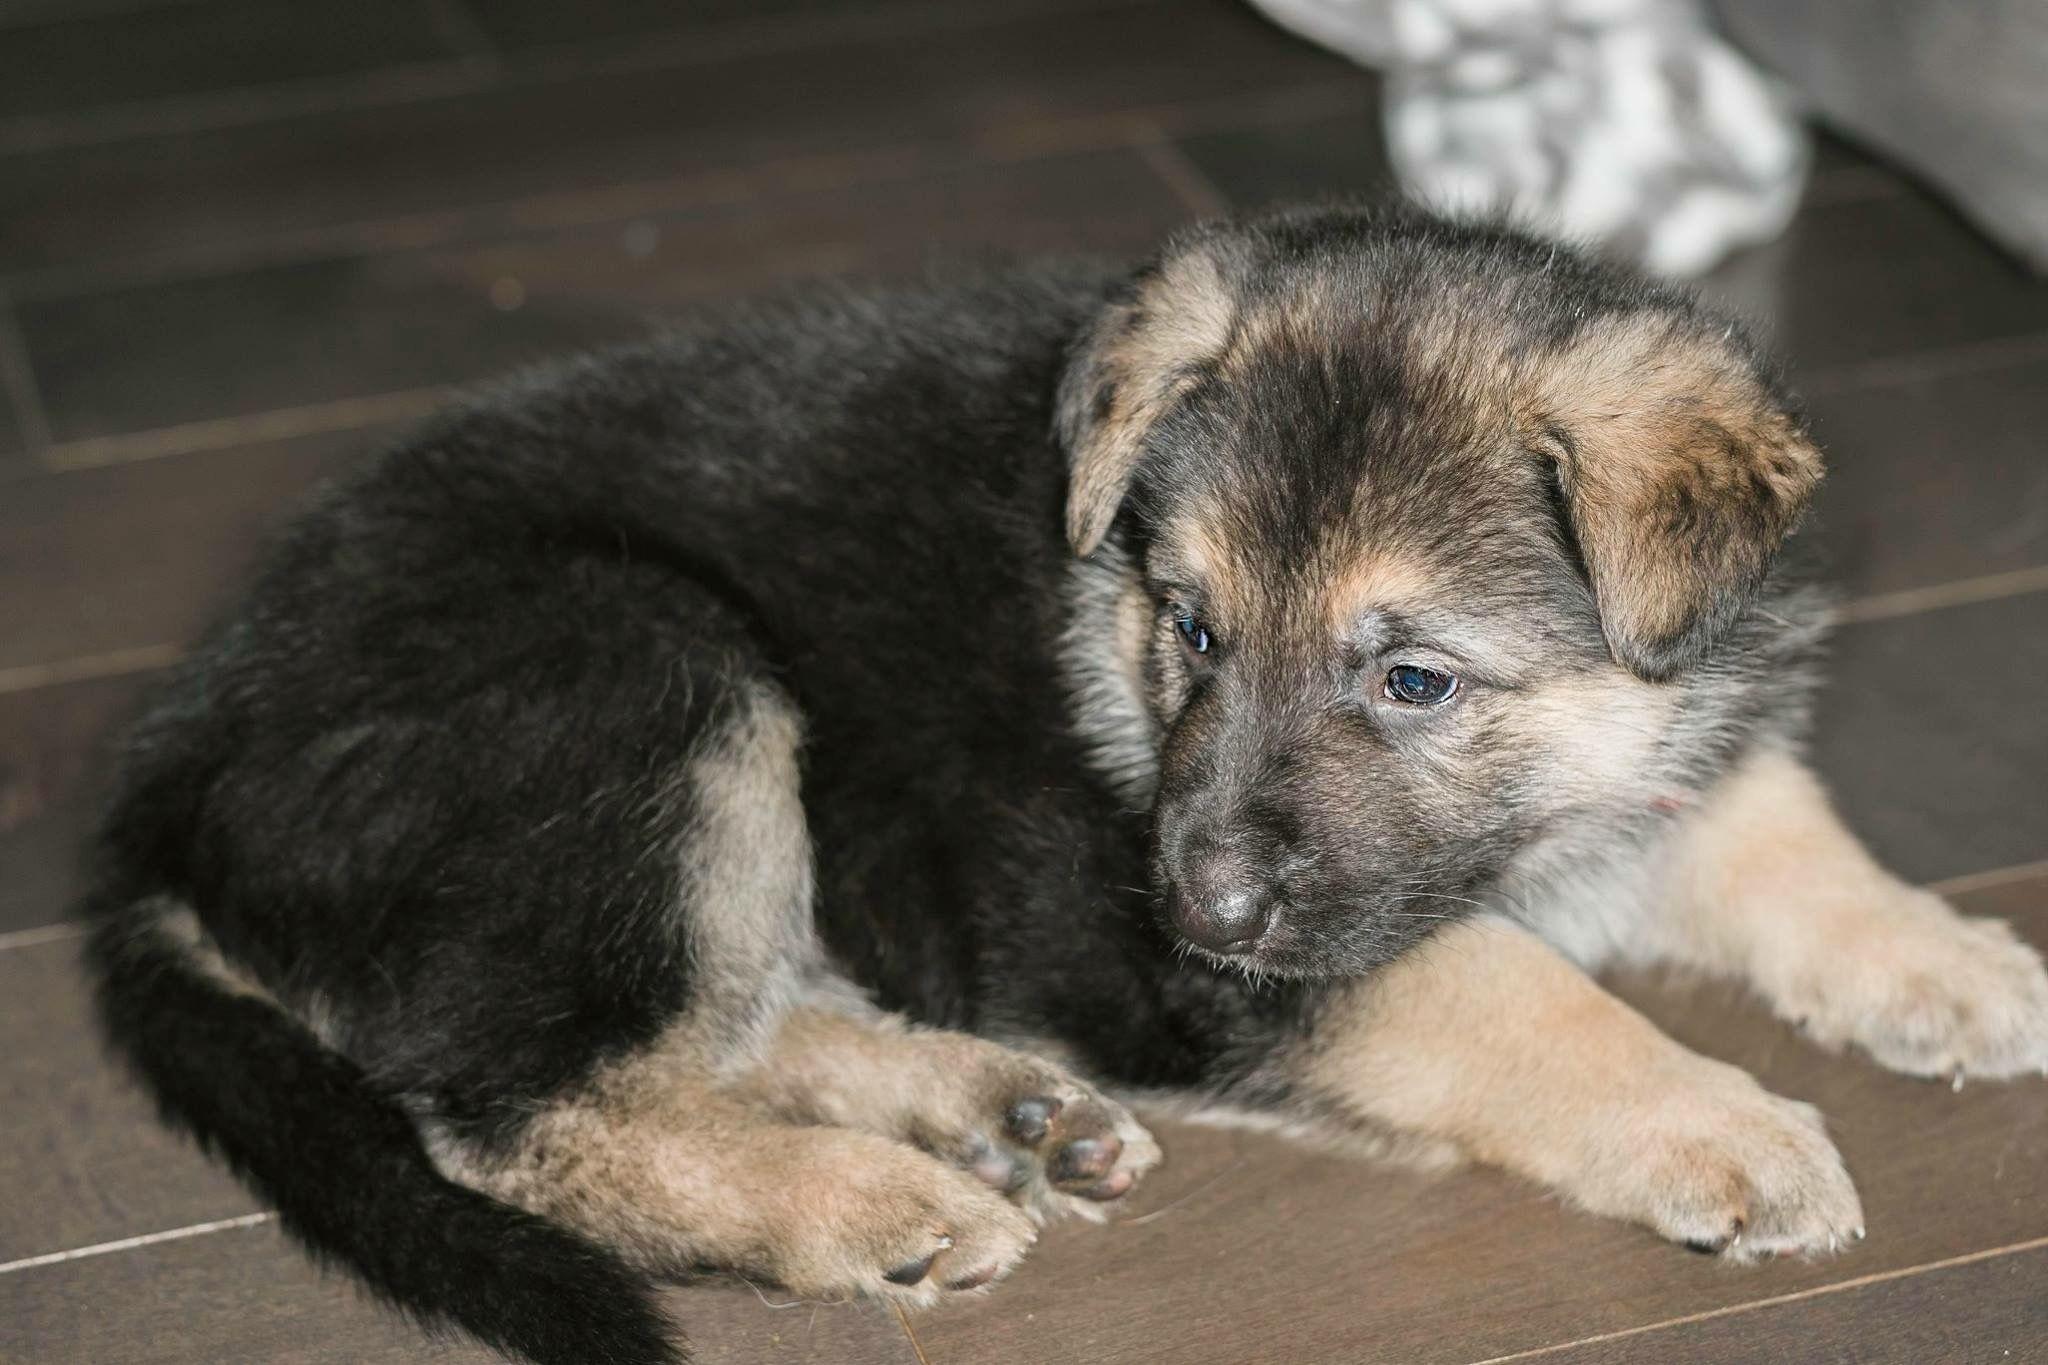 German Shepherd pup. Puppy dog photo. Pup photography